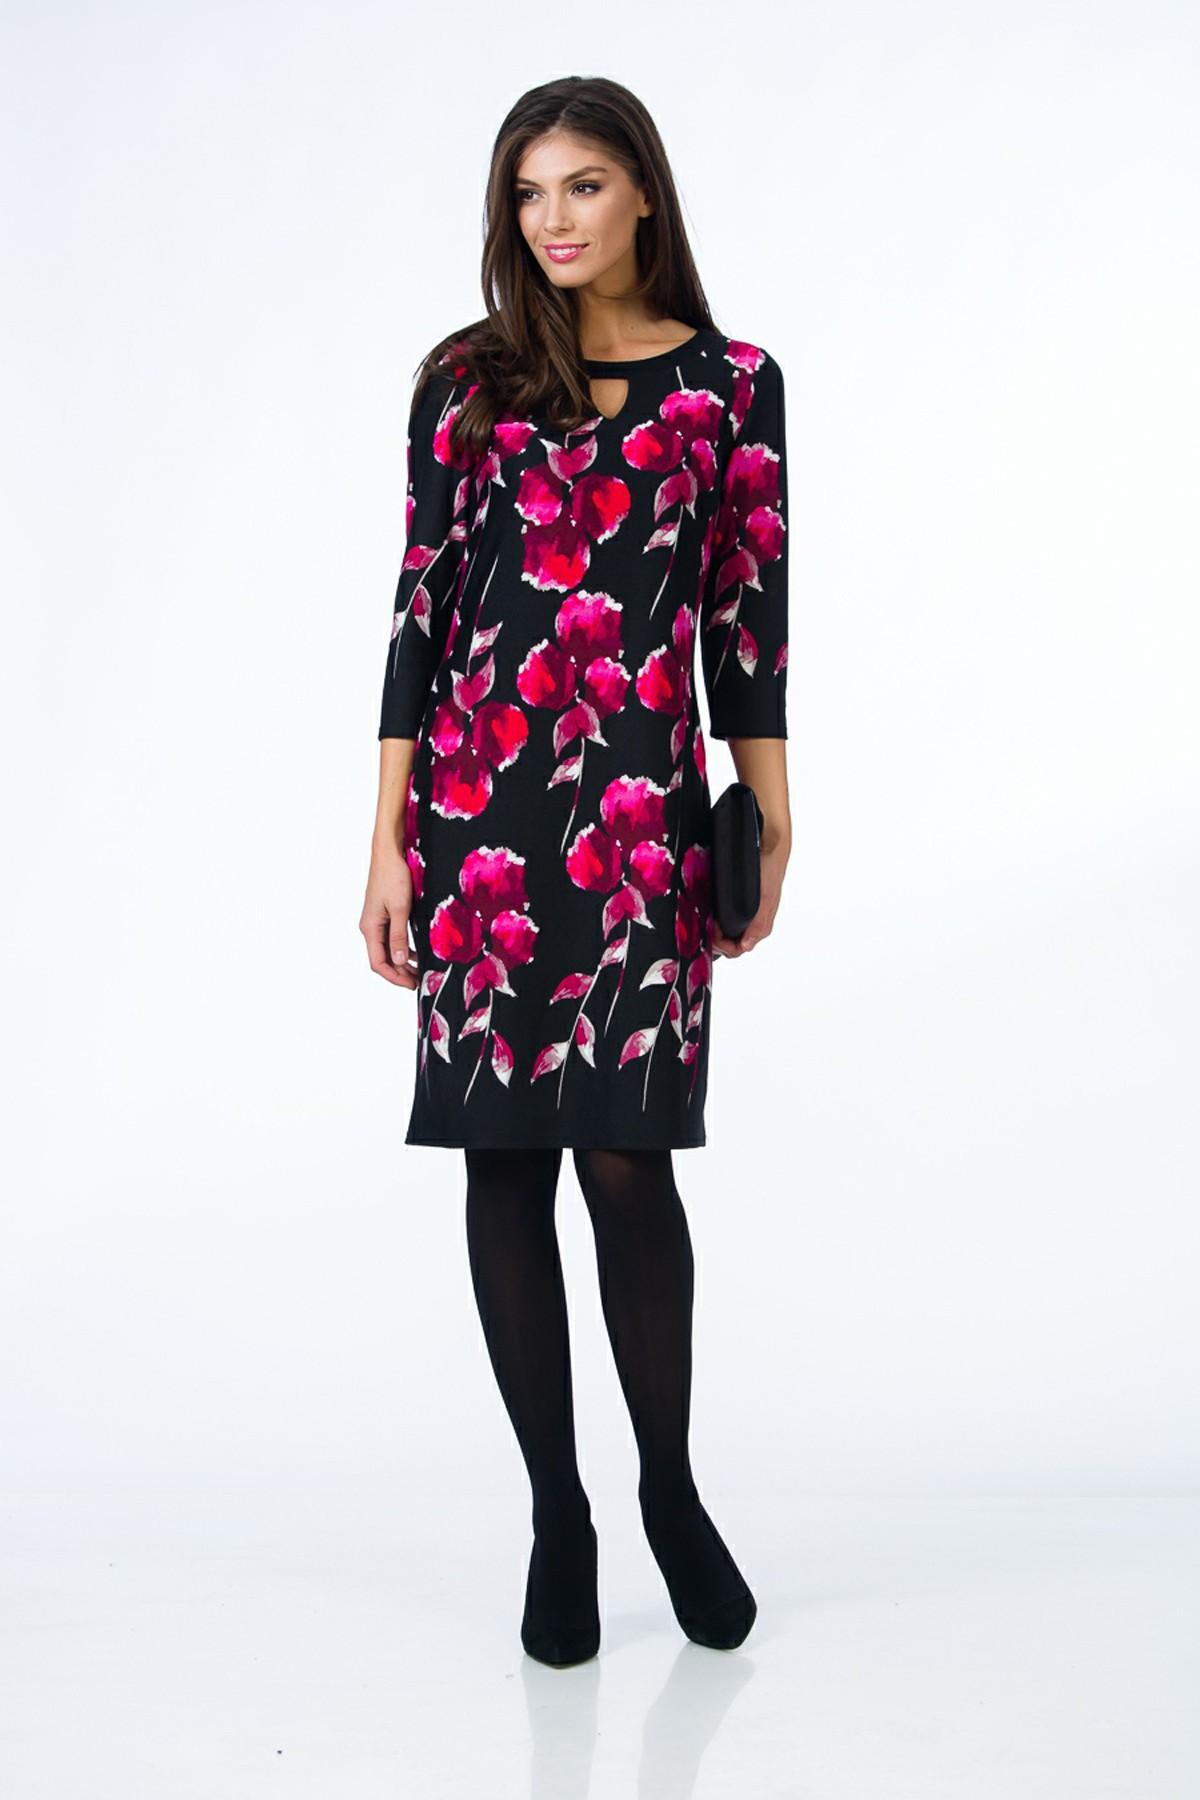 sense-rochie-imprimeu-floral